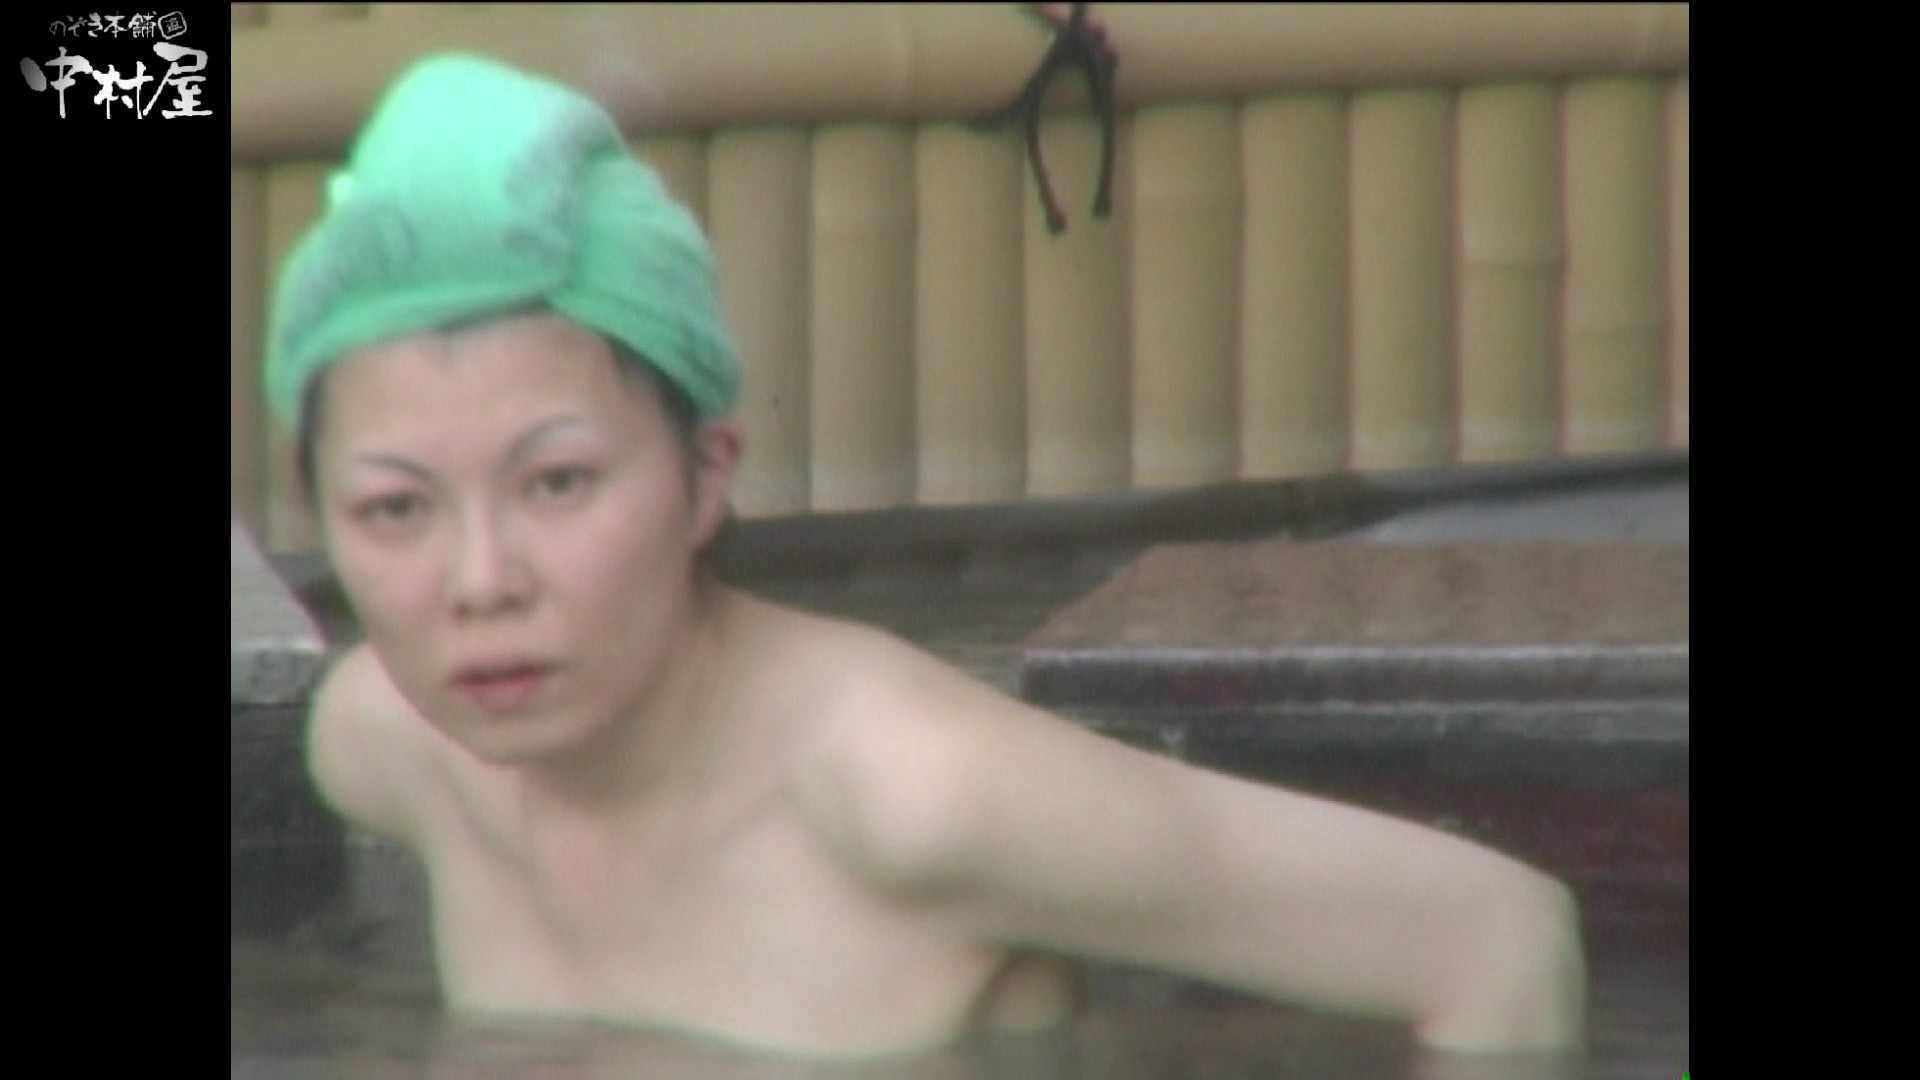 Aquaな露天風呂Vol.981 盗撮 エロ無料画像 50枚 32